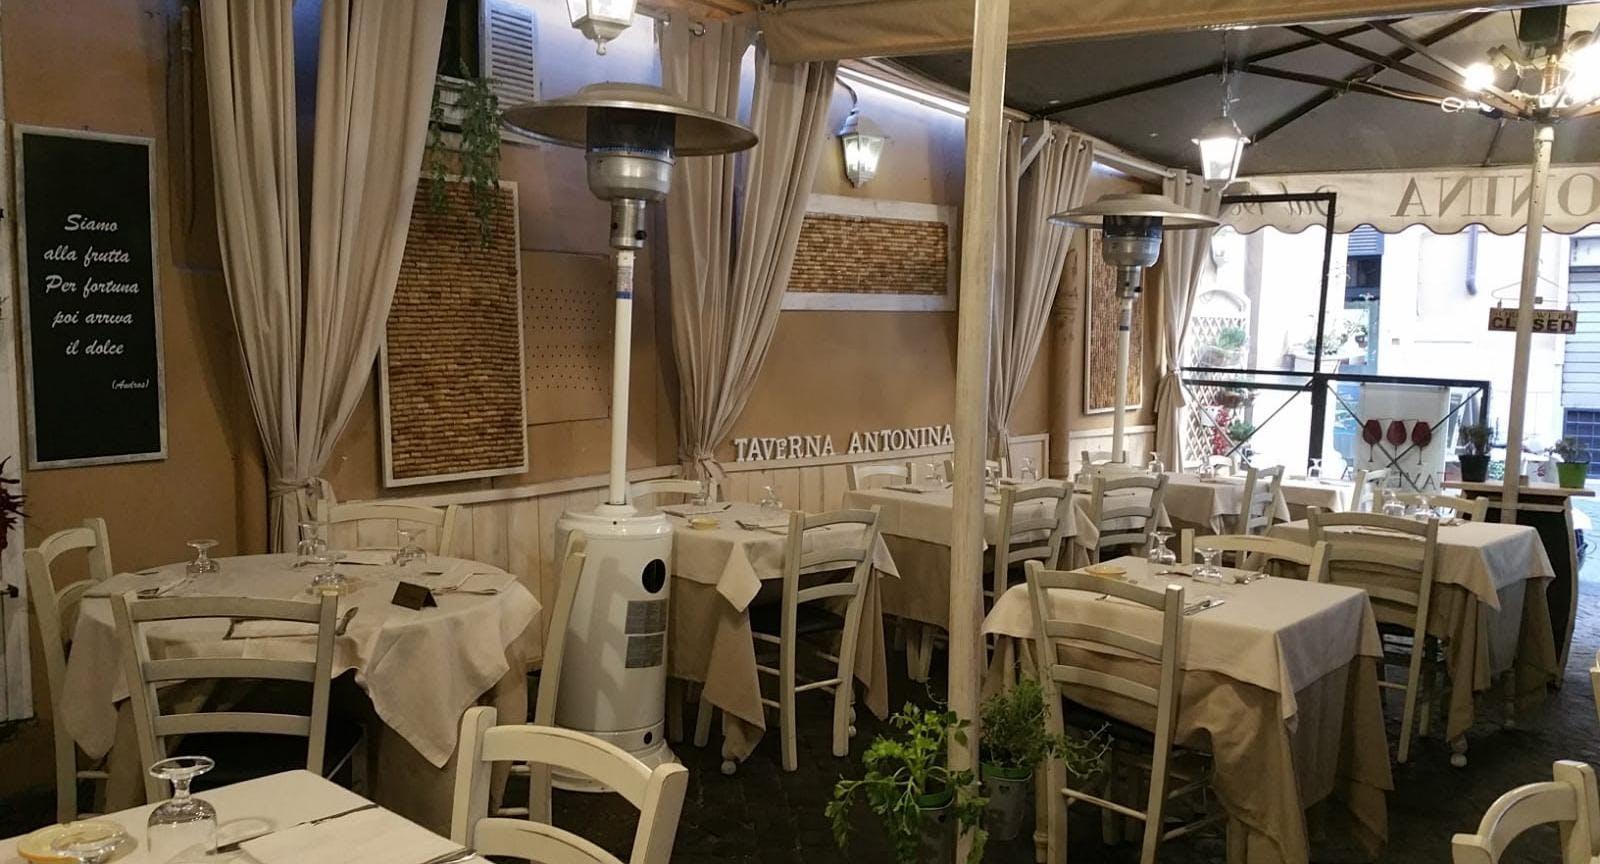 Taverna Antonina dal 1939 Rome image 3